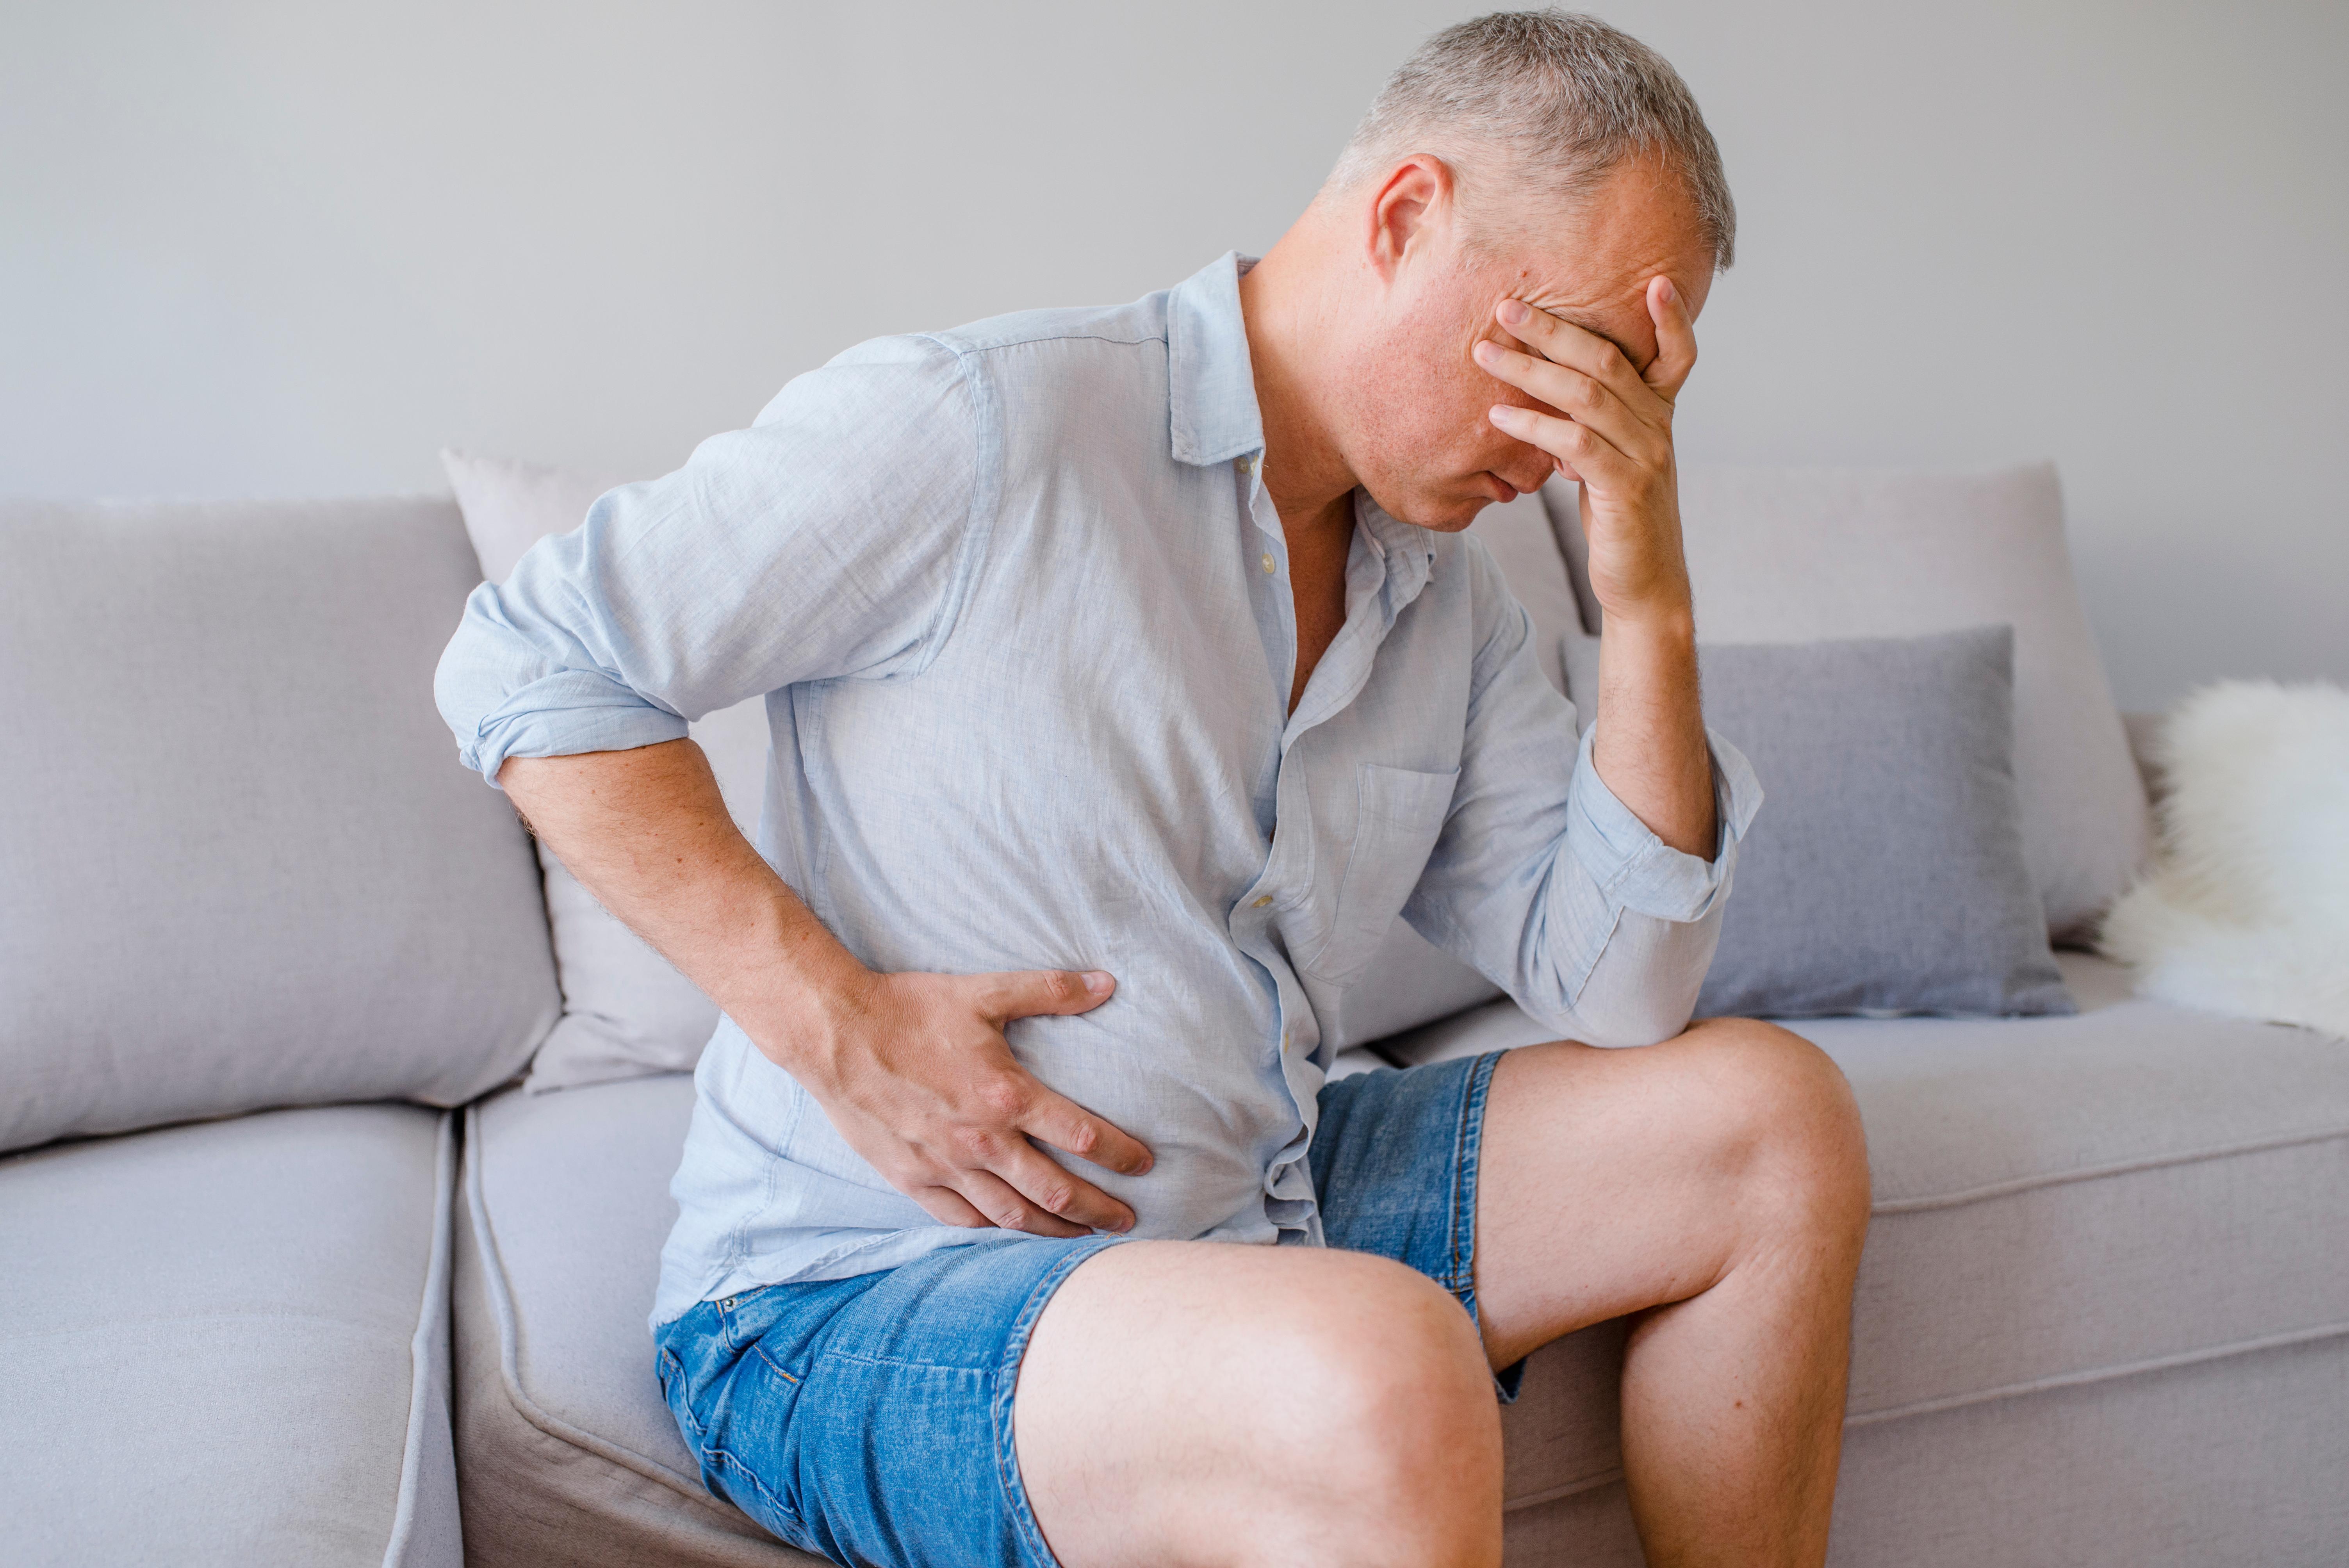 IBS (Irritable Bowel Syndrome) or Colon Cancer Symptom Comparison